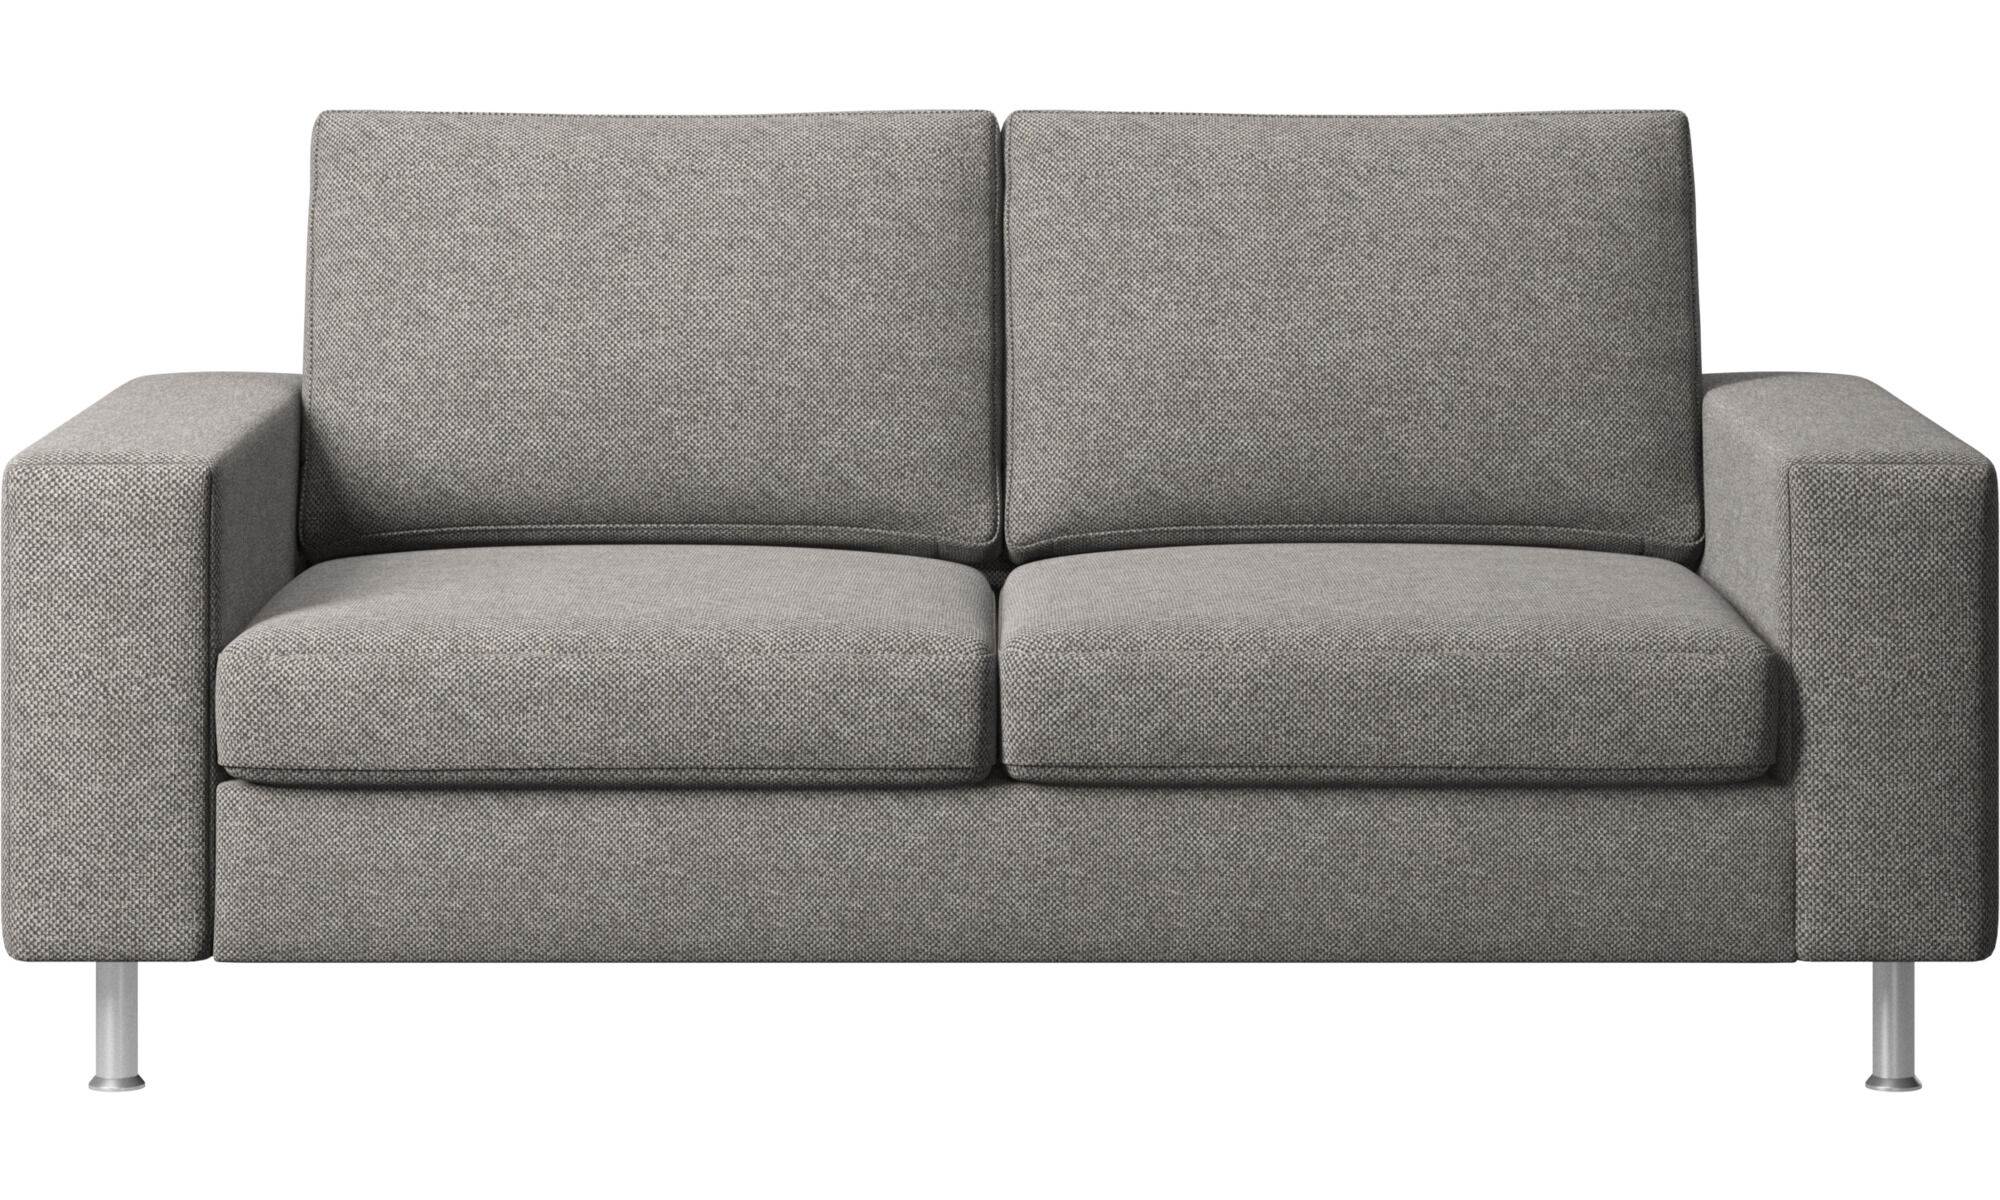 Entzuckend 2 Sitzer Sofas   Indivi Sofa   Grau   Stoff ...